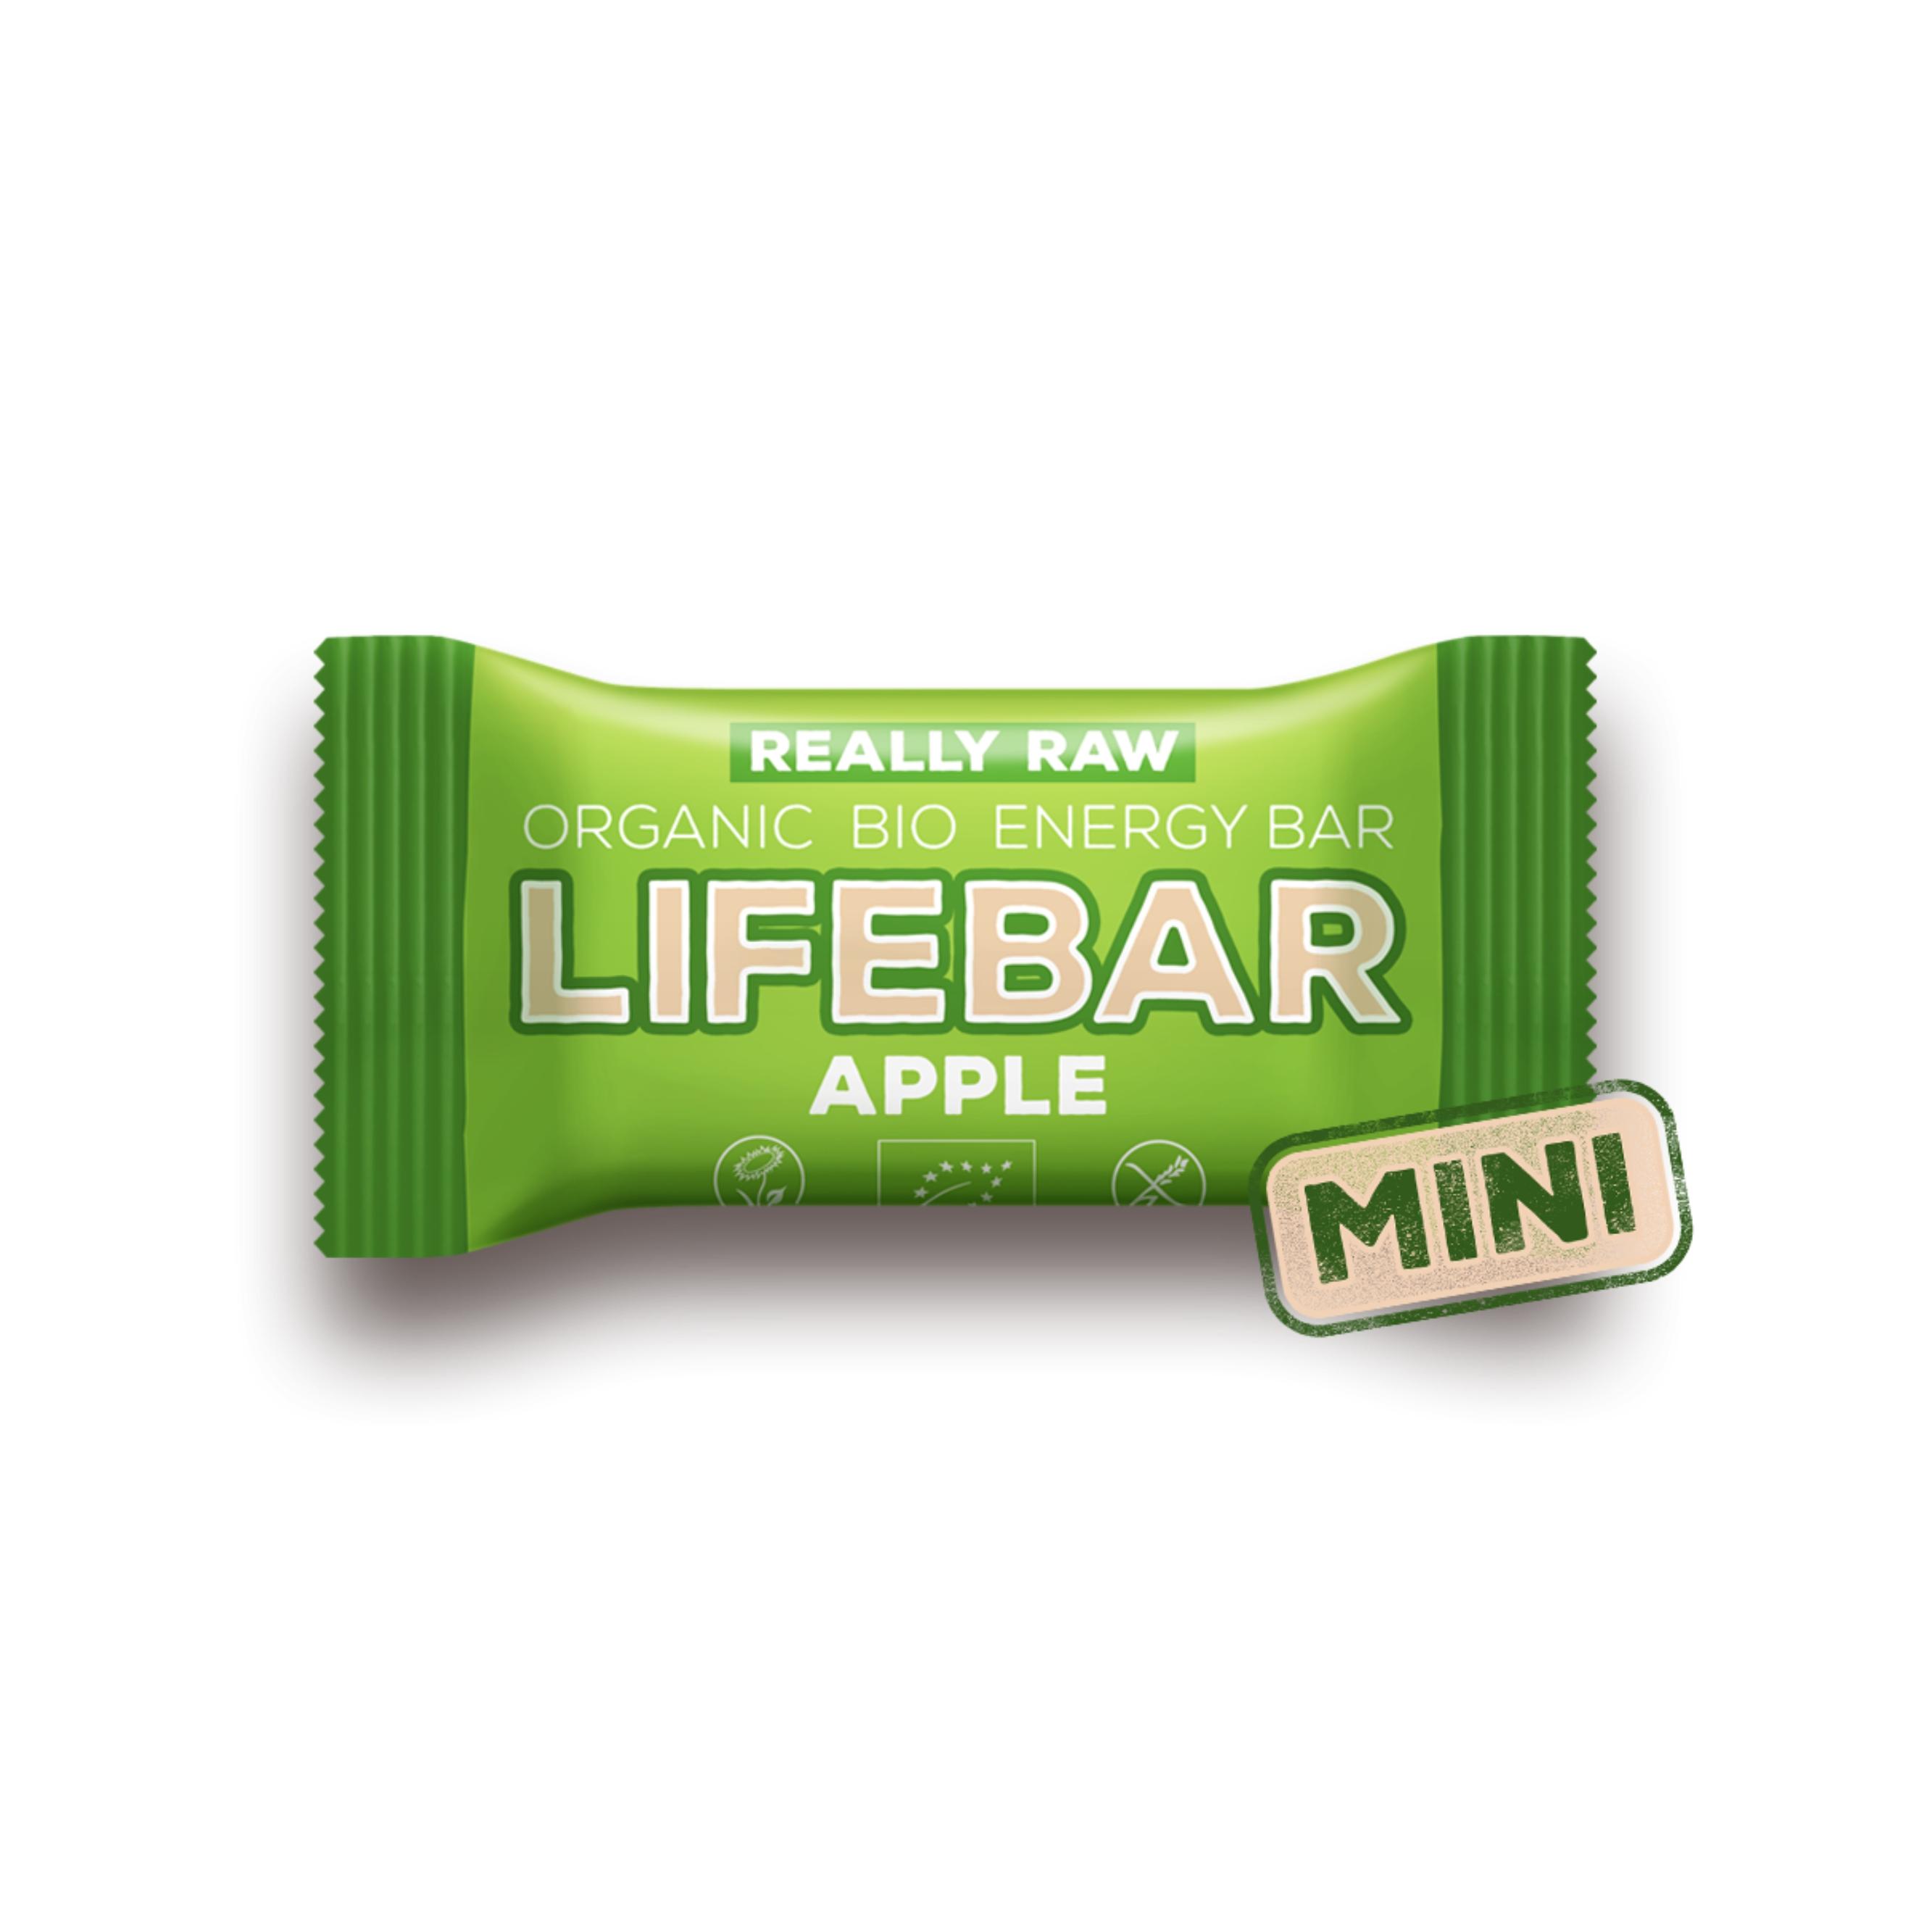 3c78c4ec408a Lifebar jablečná MINI BIO RAW 25 g Lifefood - BIO a přírodní ...